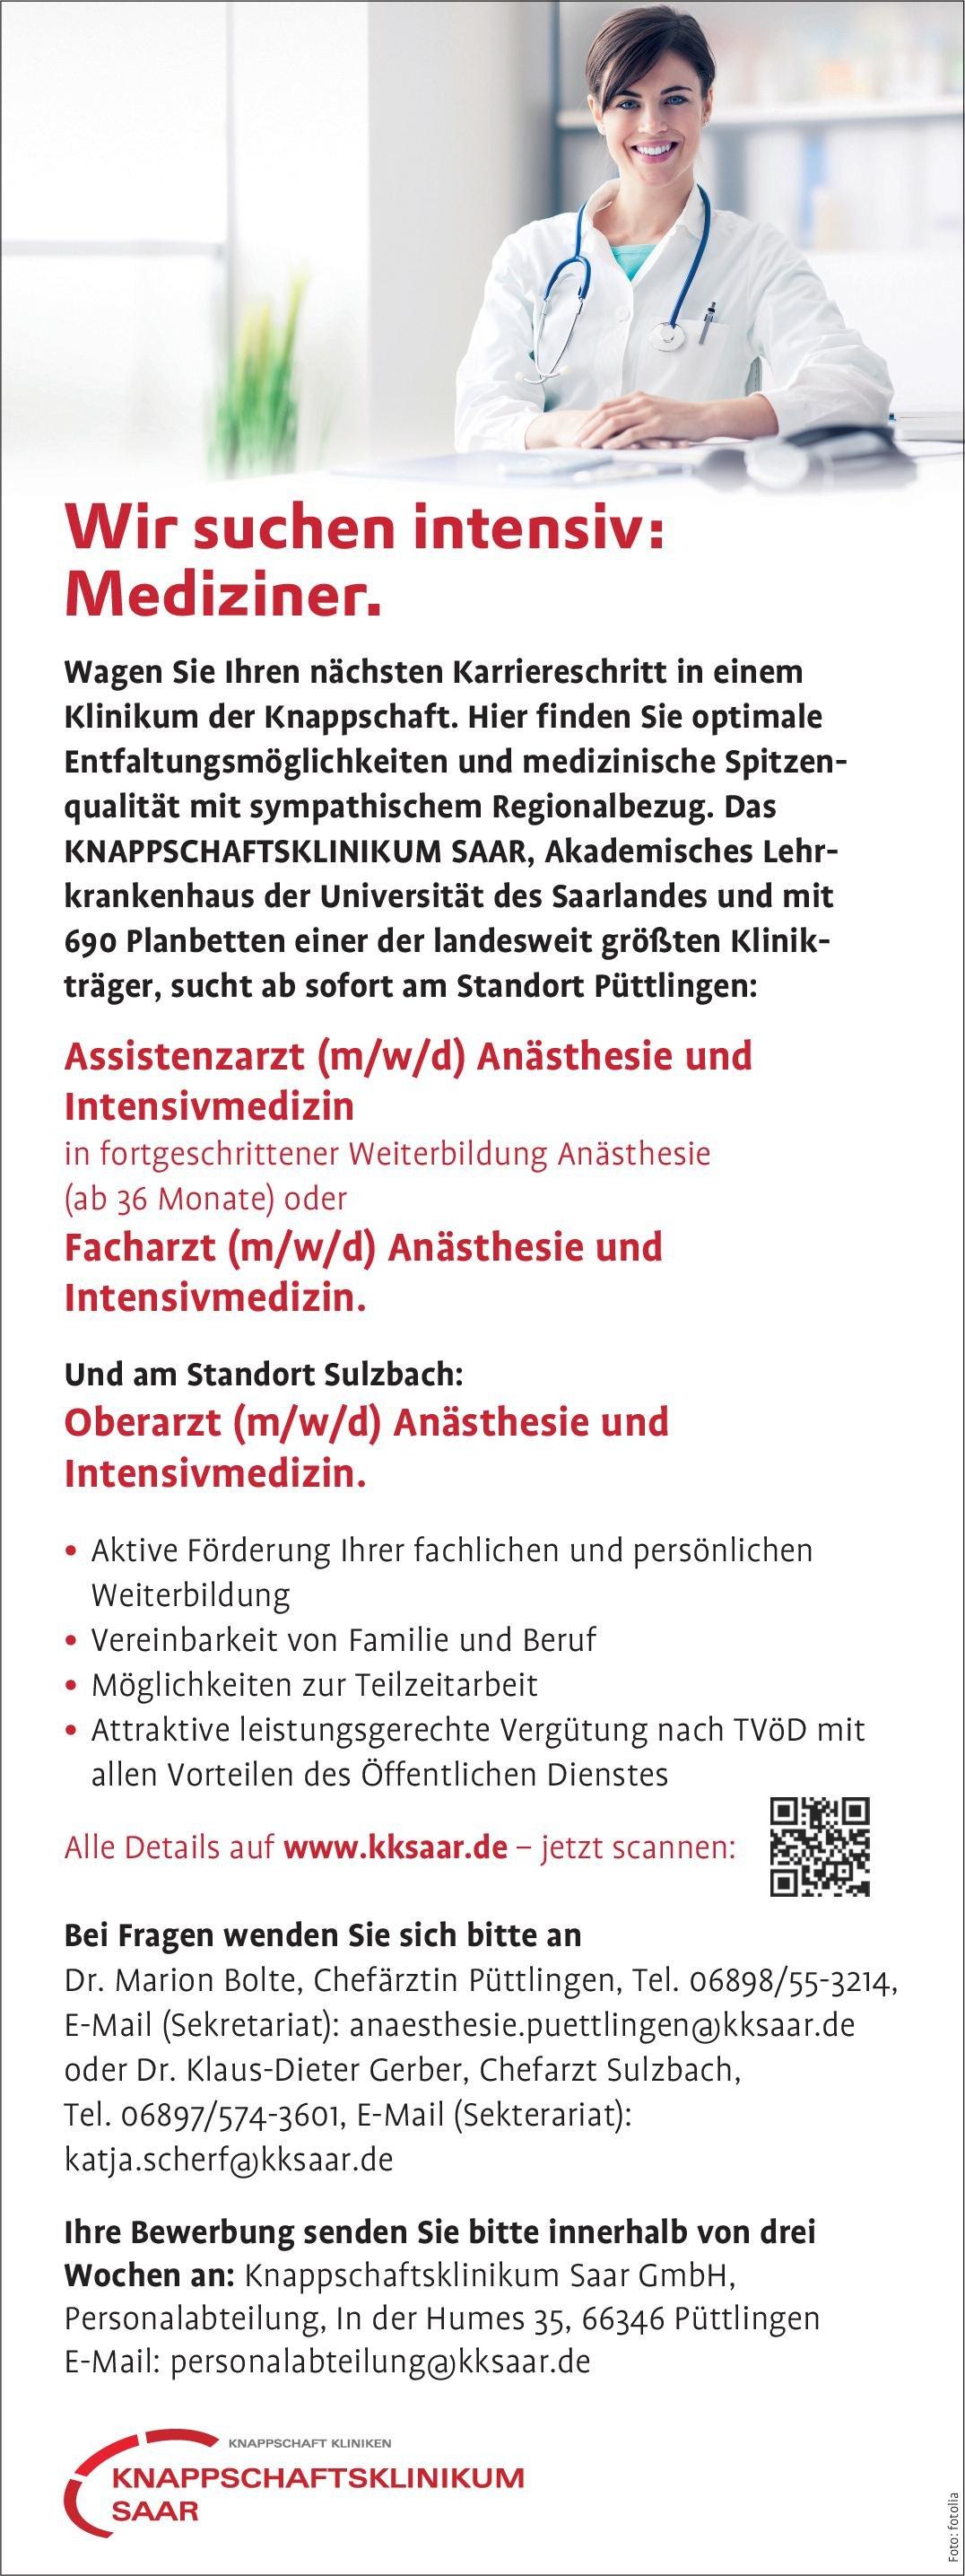 KNAPPSCHAFTSKLINIKUM SAAR Oberarzt (m/w/d) Anästhesie und Intensivmedizin Anästhesiologie / Intensivmedizin Oberarzt